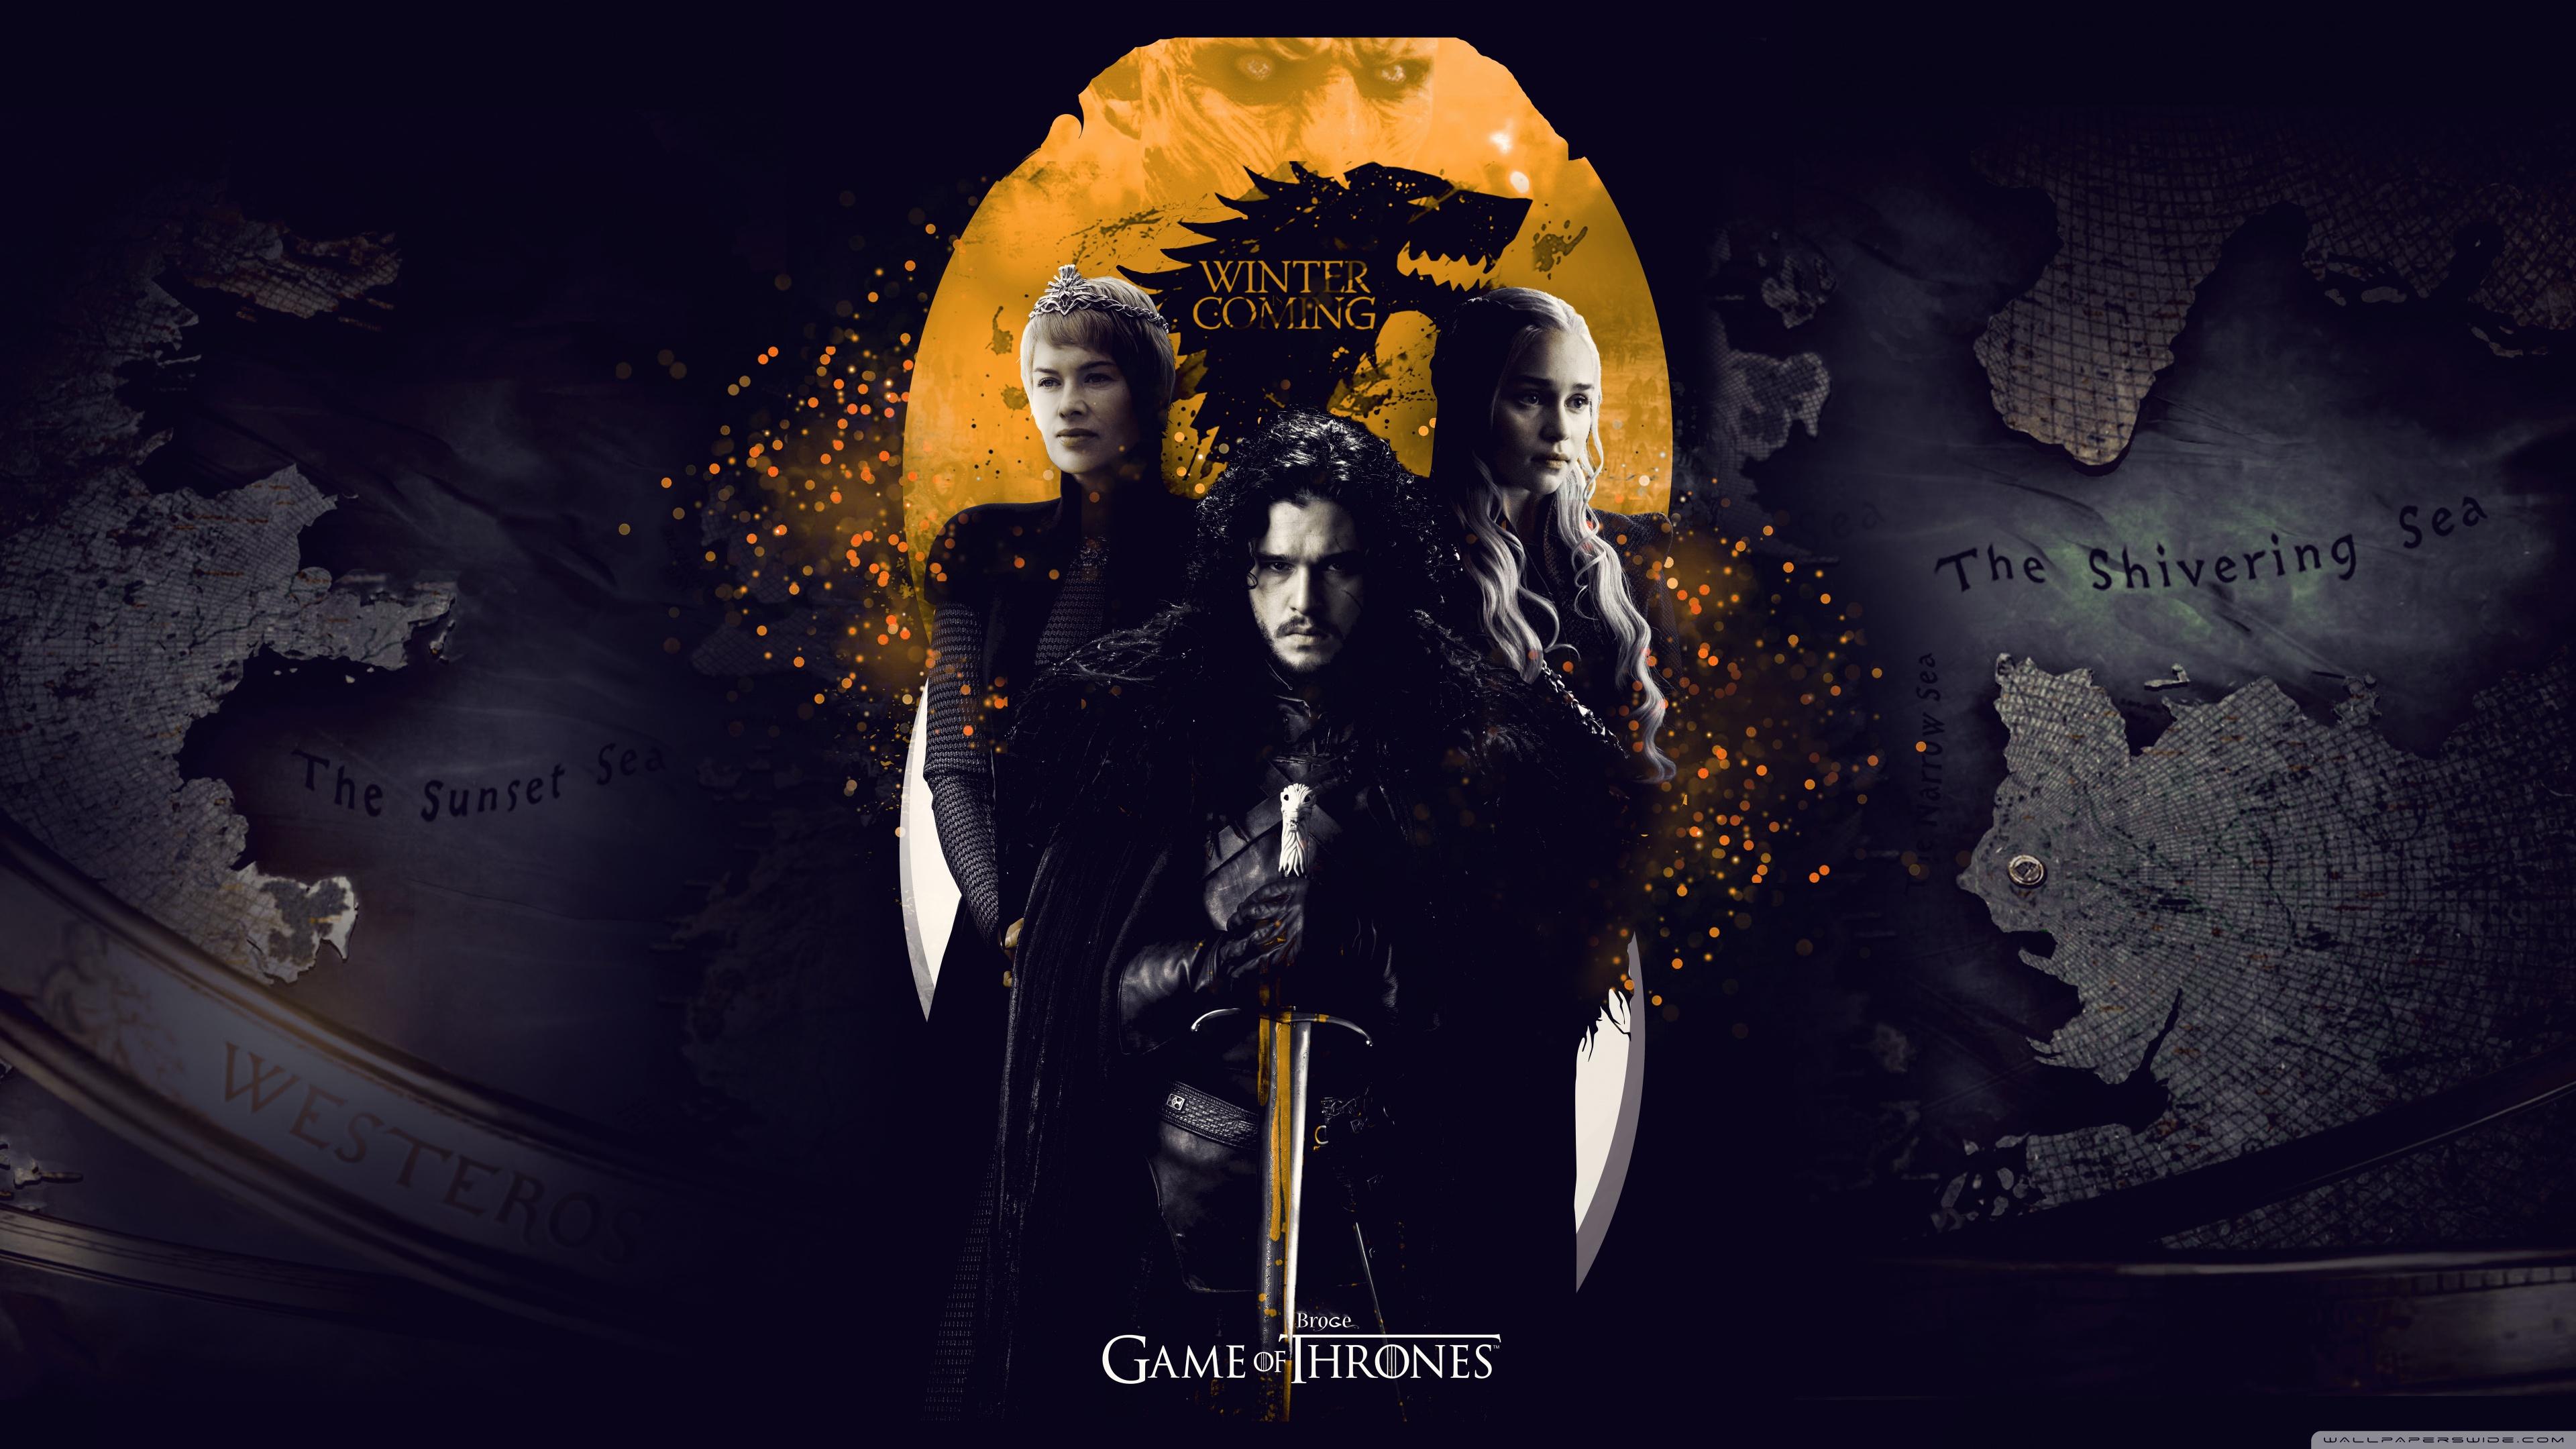 Game of Thrones 4K HD Desktop Wallpaper for 4K Ultra HD TV 3840x2160